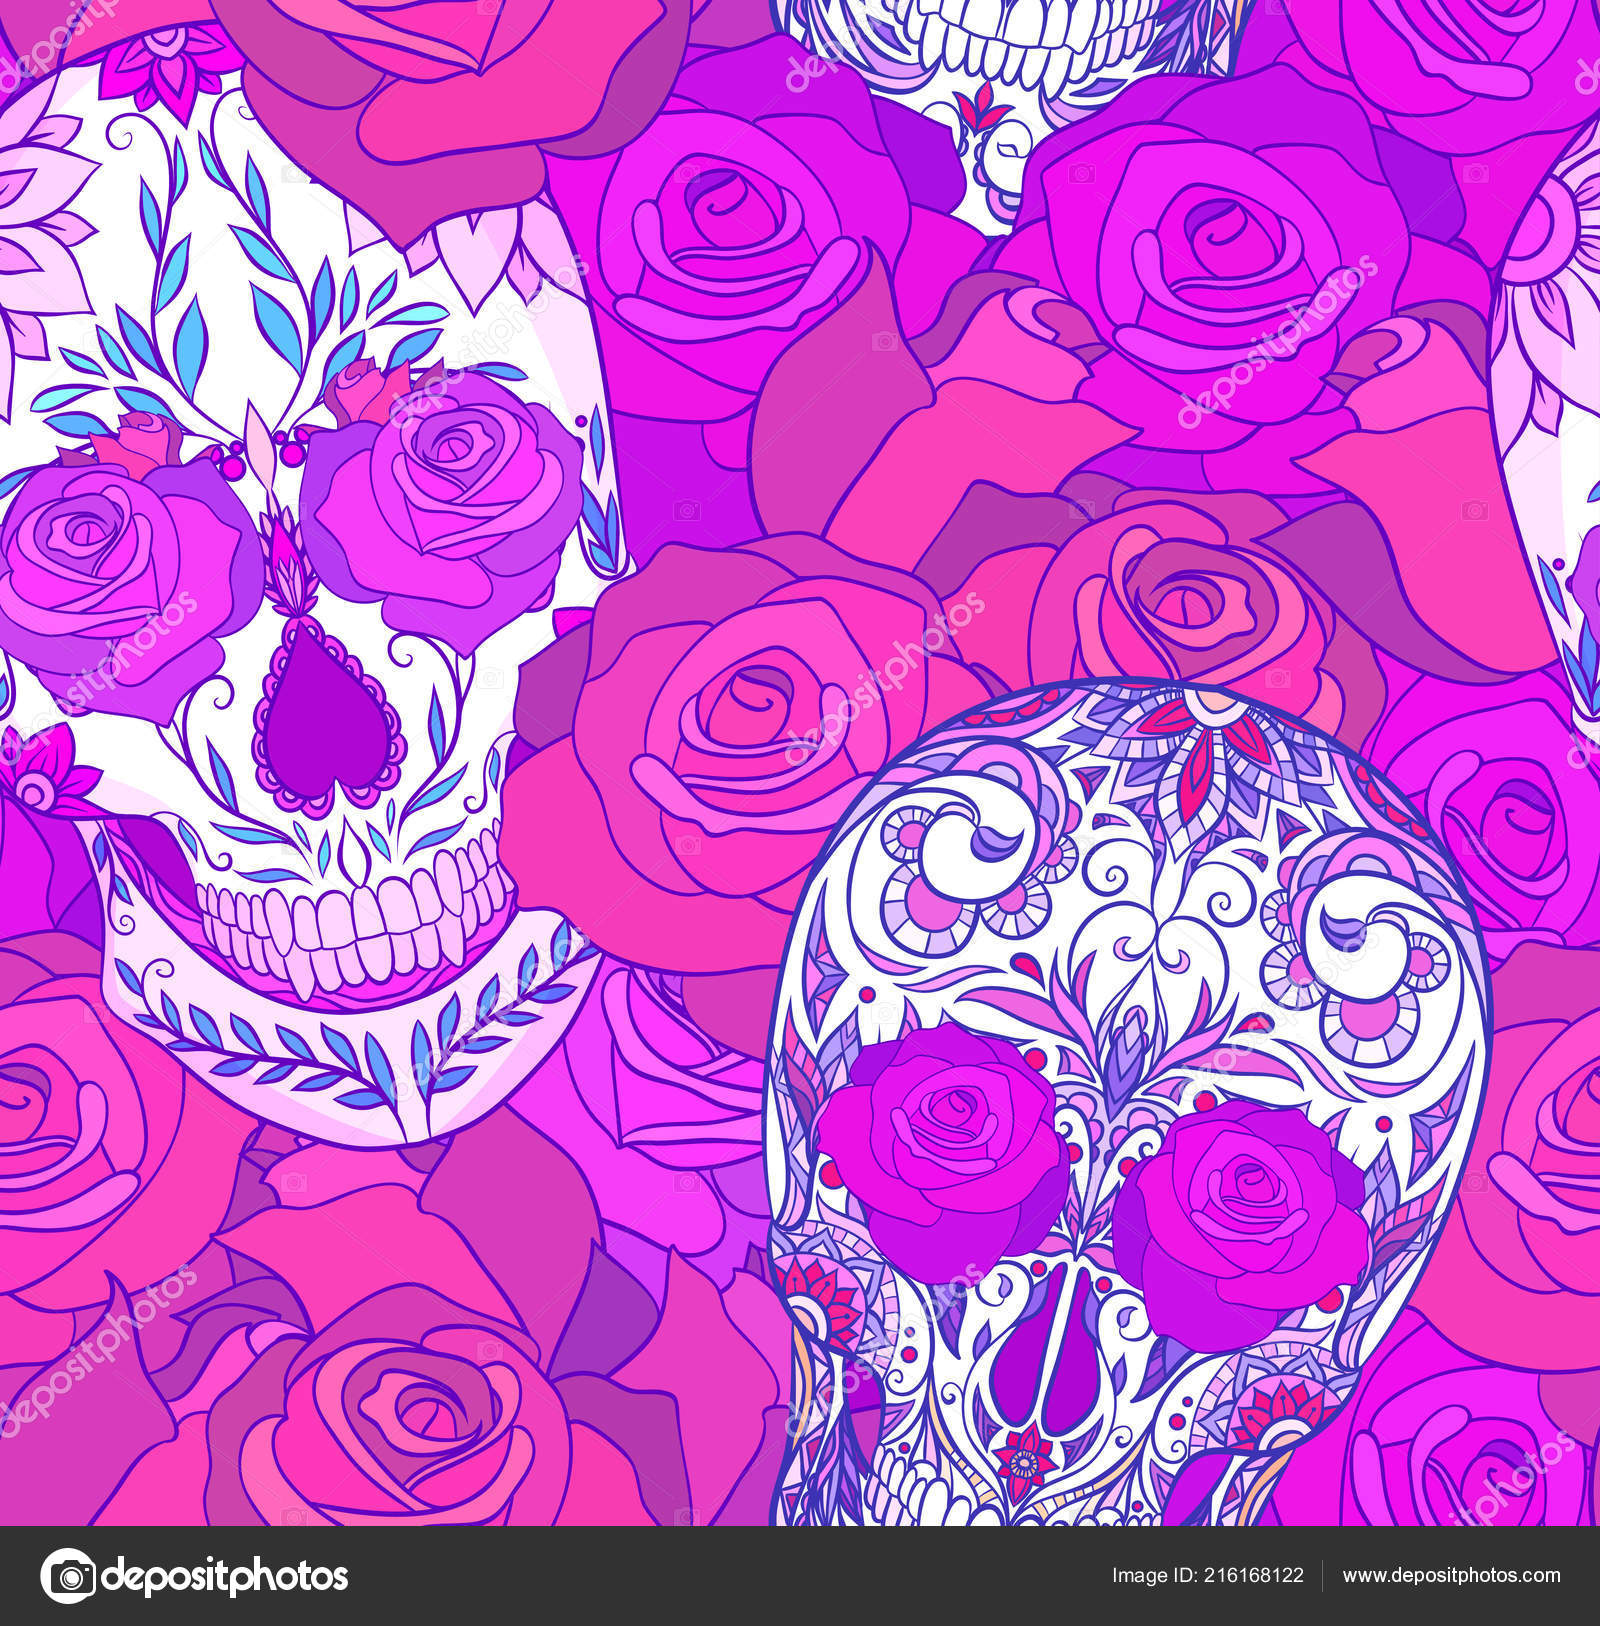 Sugar Skull And Roses Wallpaper Seamless Neon Texture